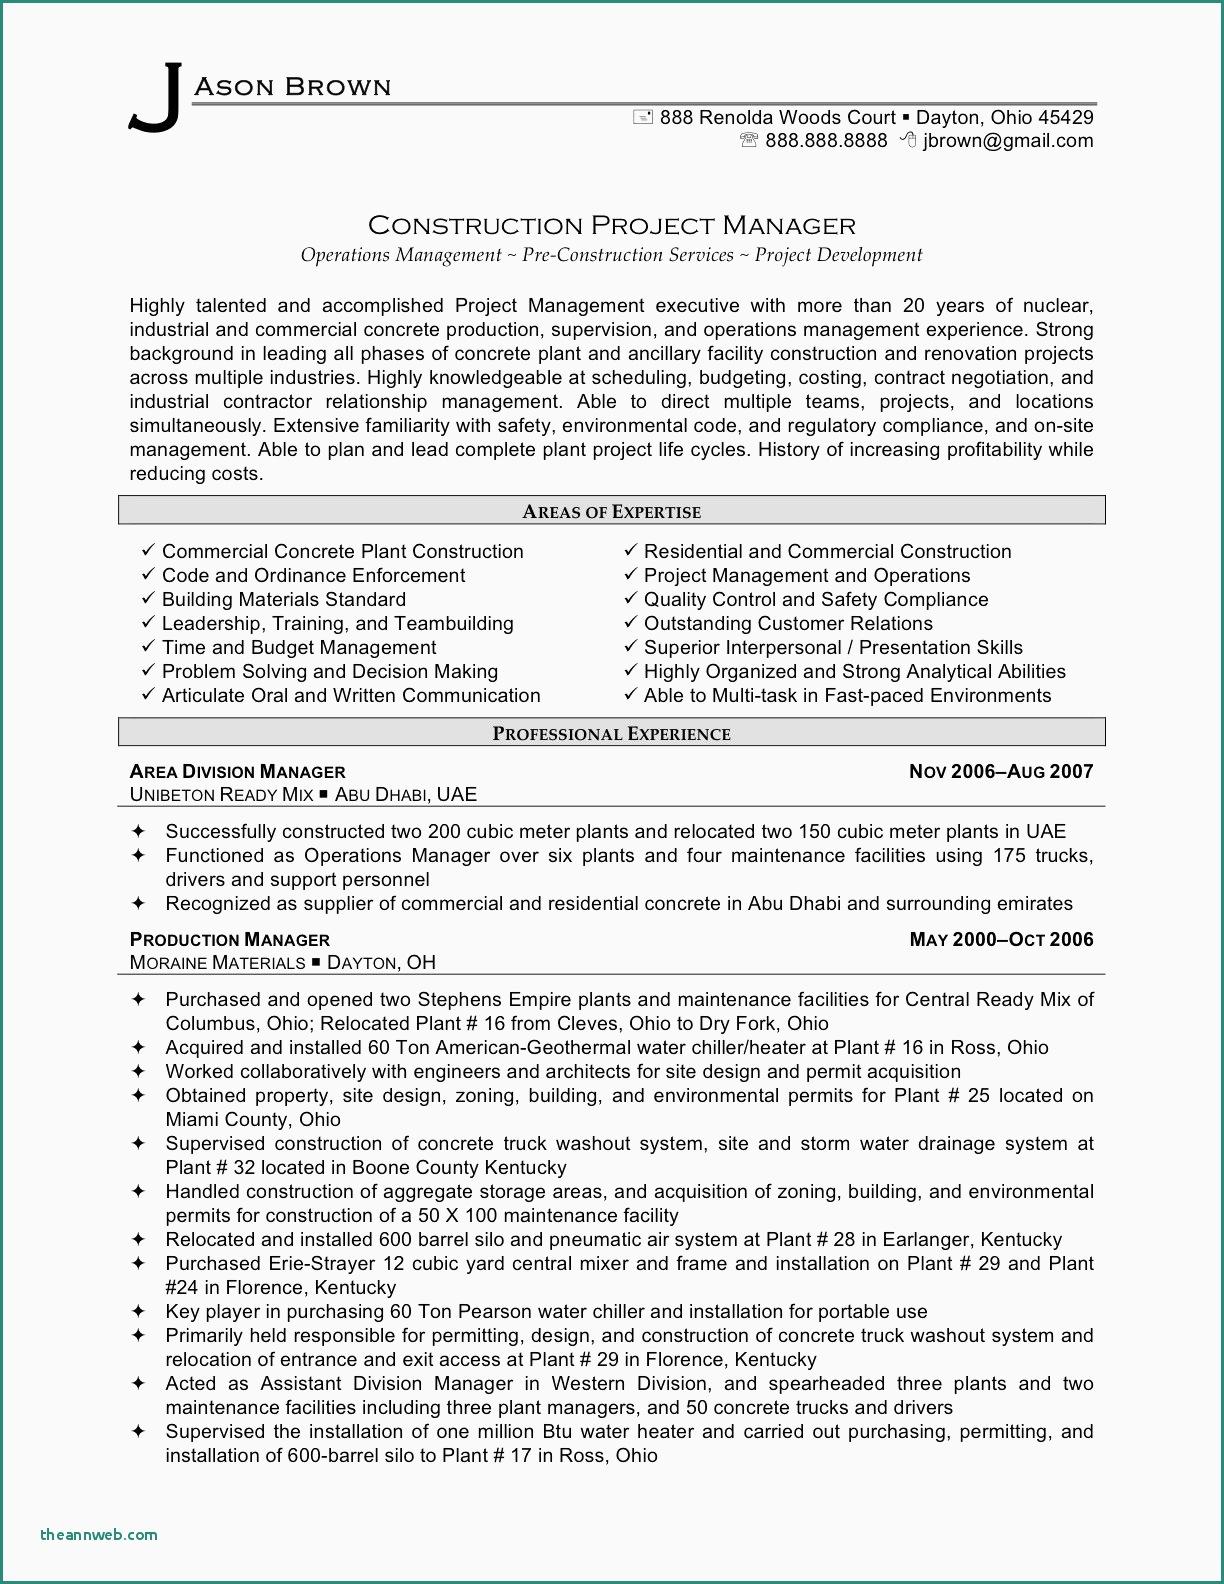 cover letter design template Collection-Civil Design Engineer Sample Resume New Programmer Resume Lovely Resume Cover Letter formatted Resume 0d 19-e